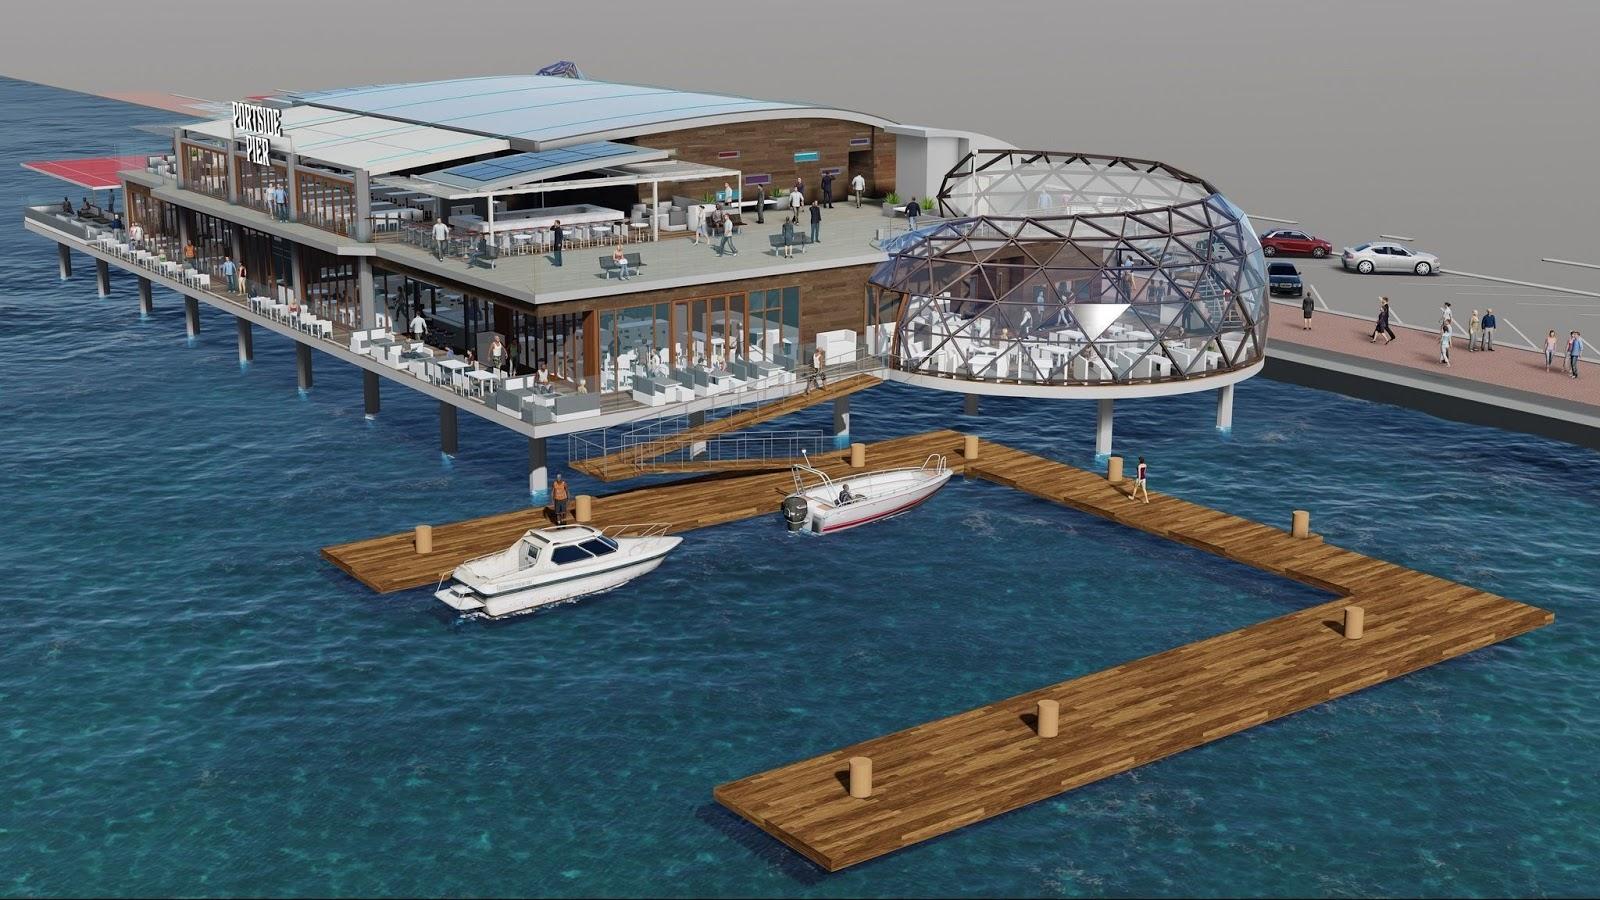 Pier South Restaurant Imperial Beach